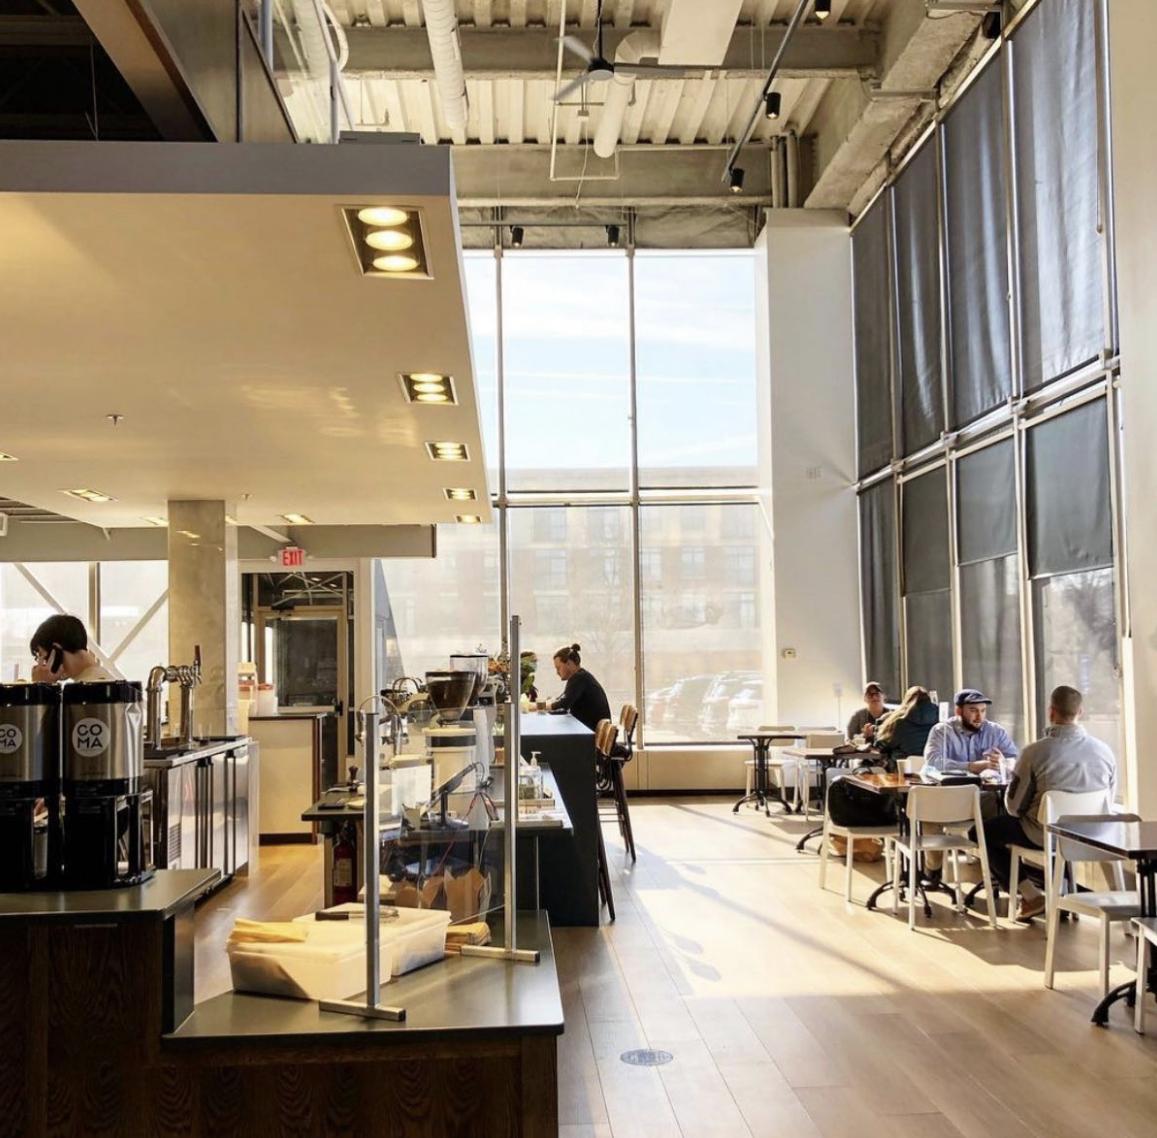 Coma Coffee bar